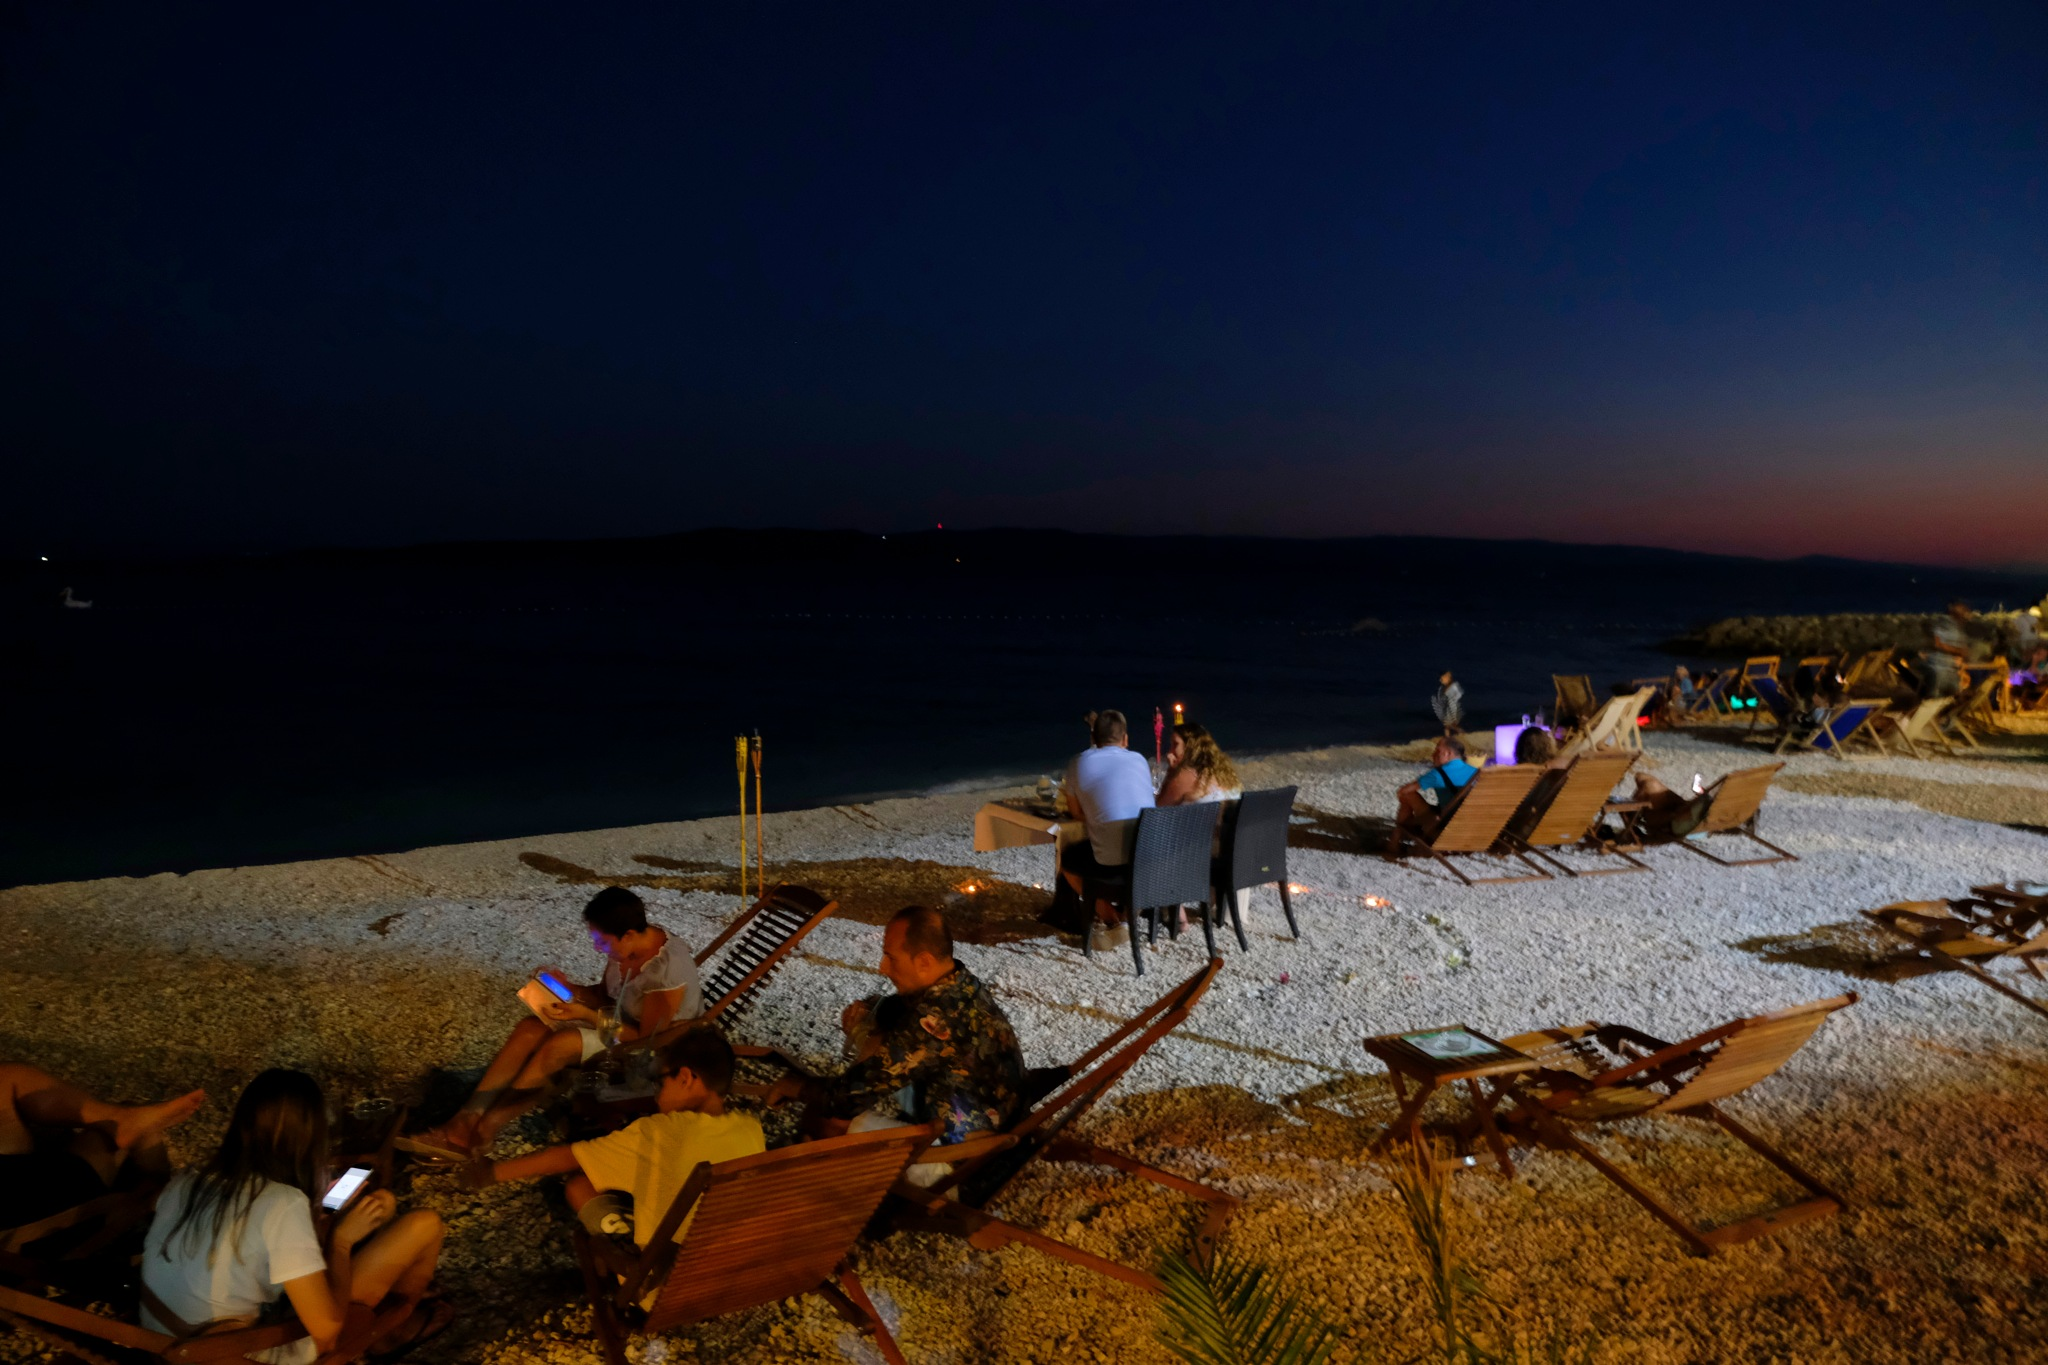 Night on The Beach by Goran Jorganovich